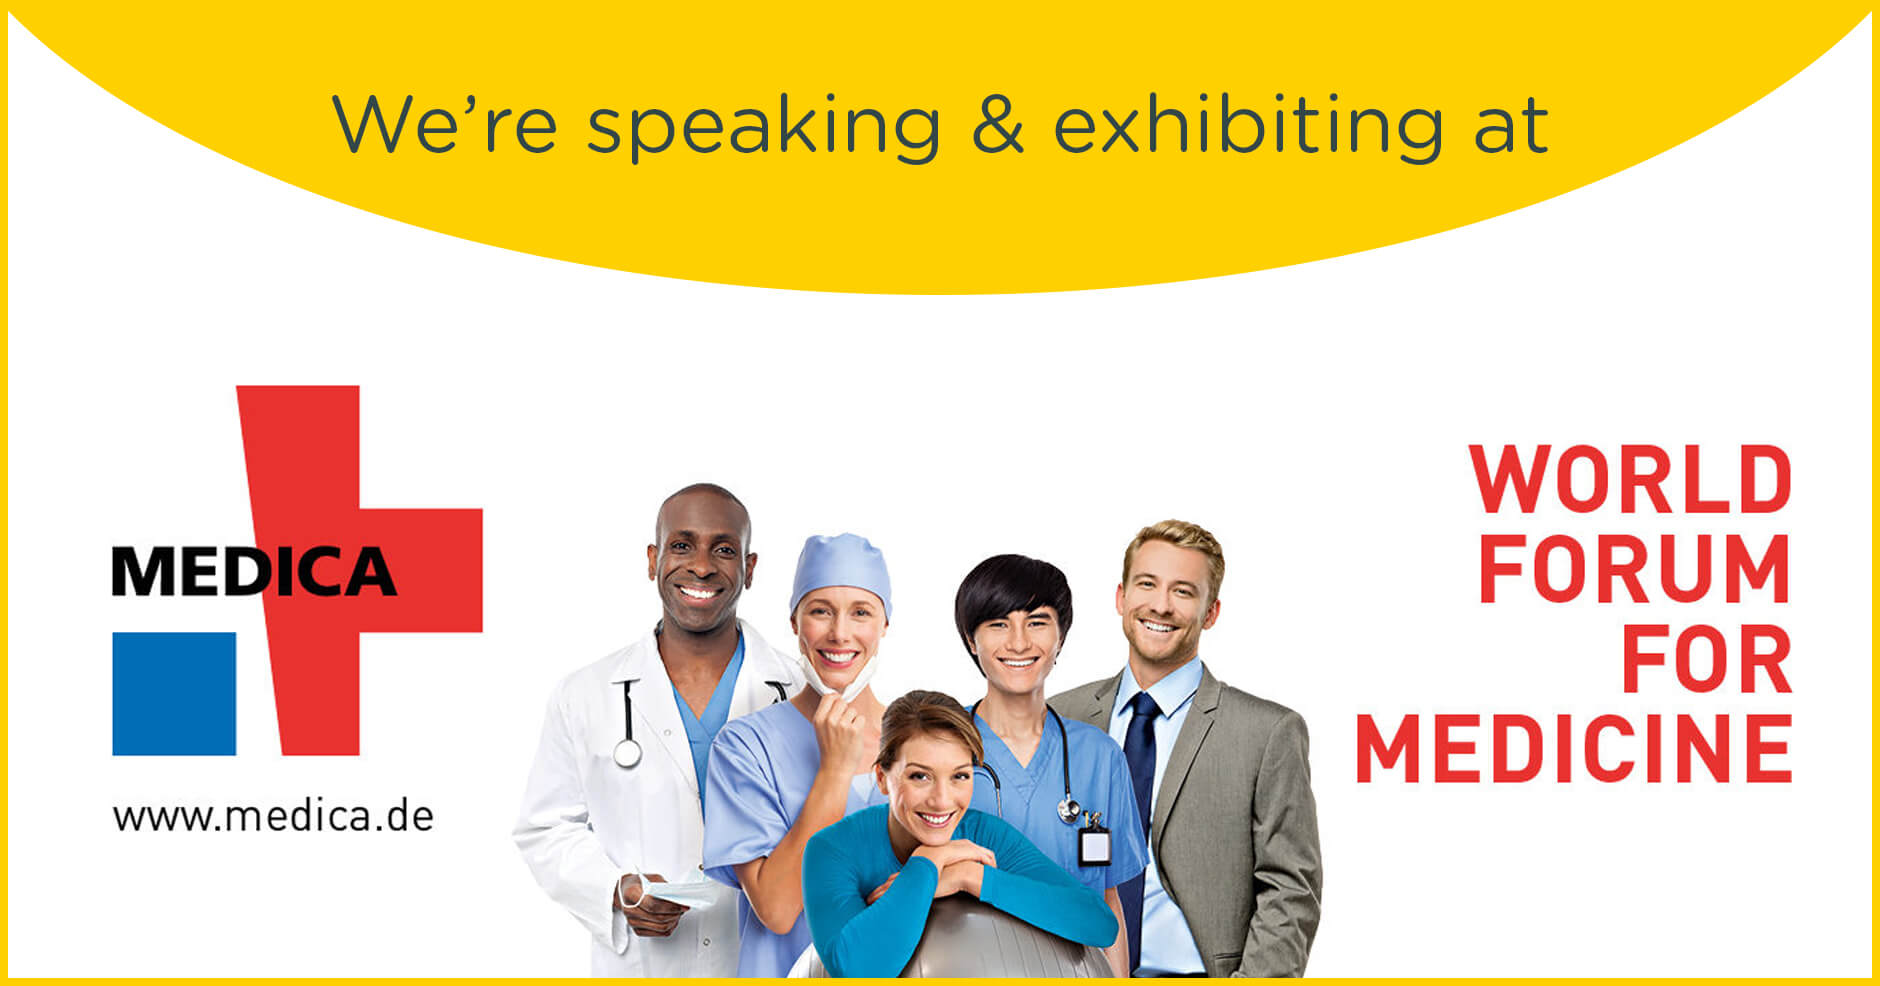 Medica Düsseldorf - 18-21 November 2019